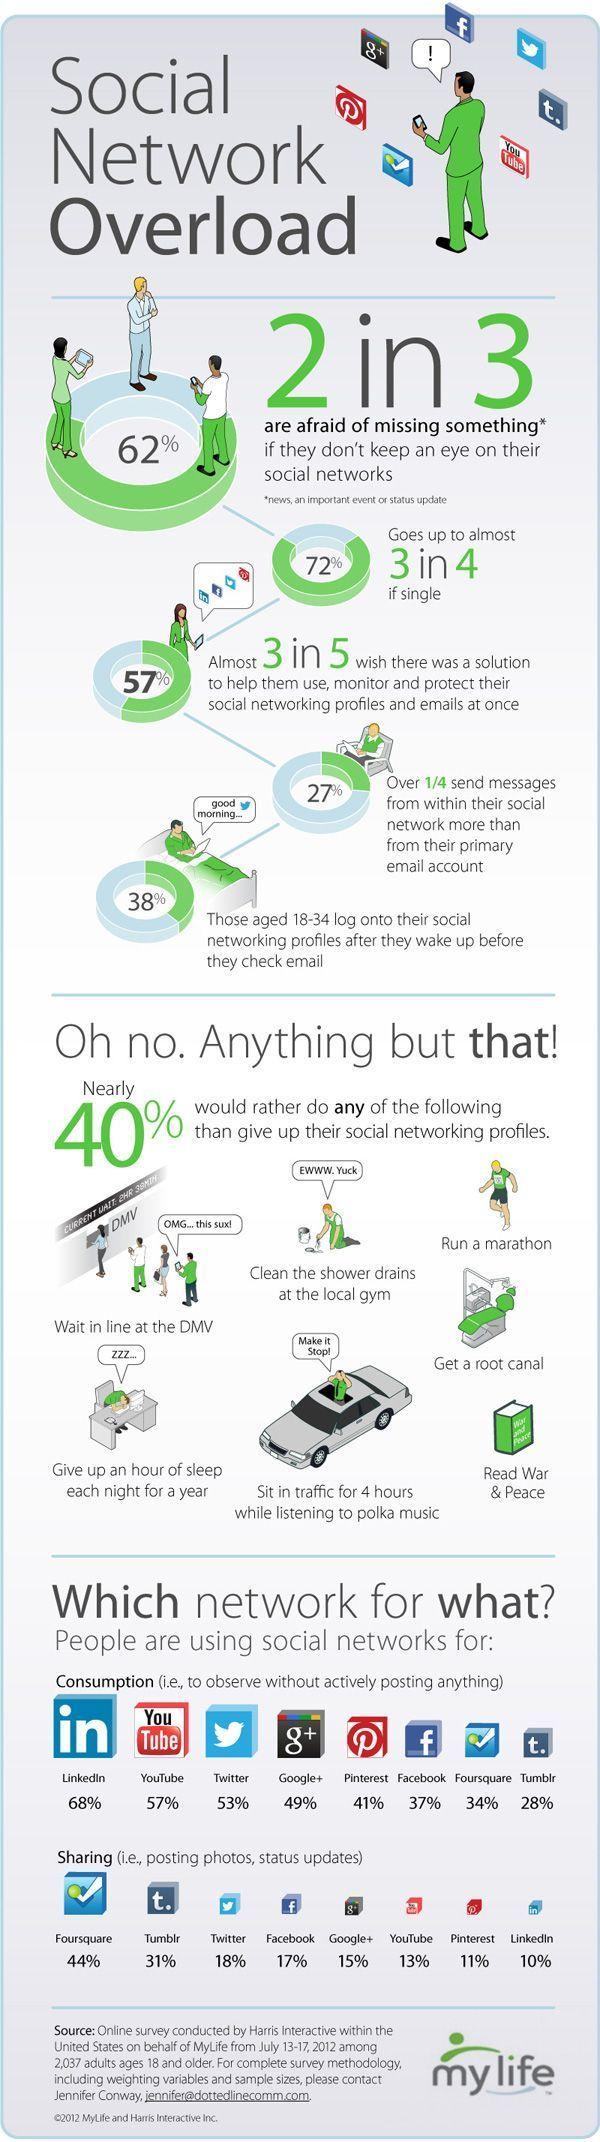 Social Network Overload